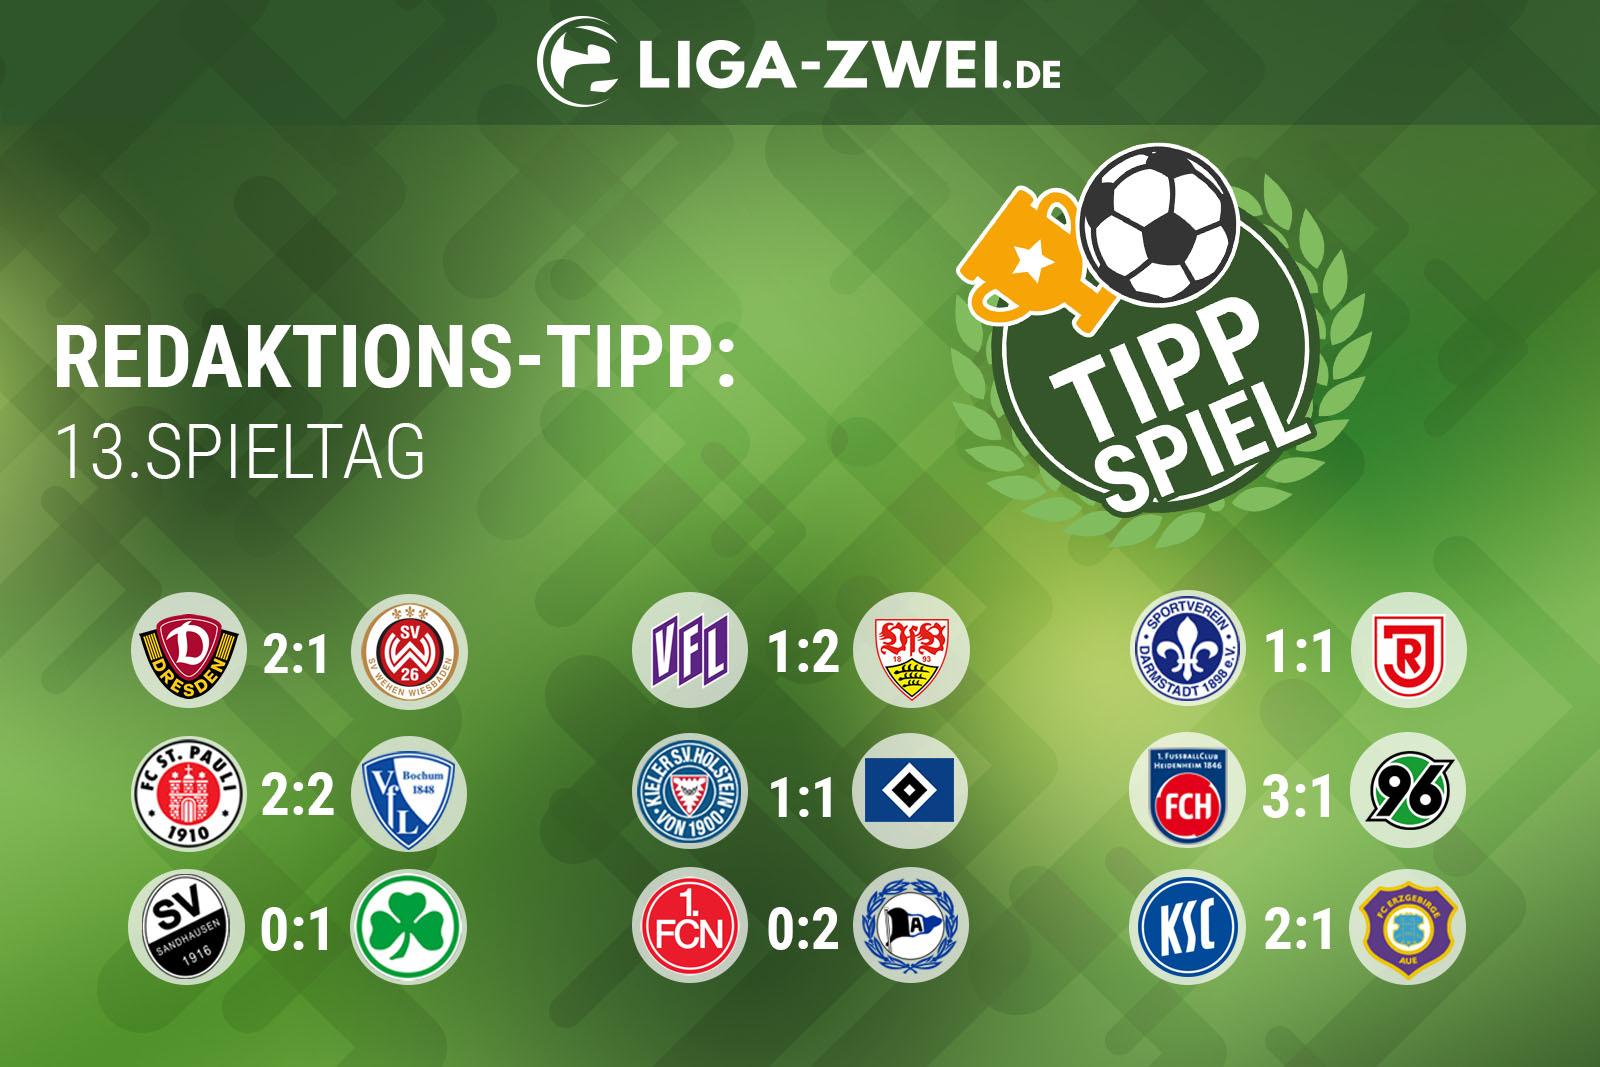 Redaktionstipp zur 2. Bundesliga